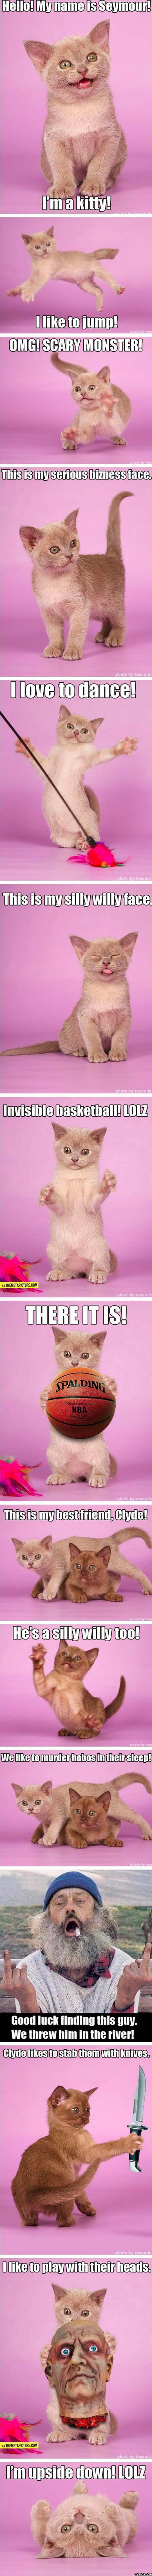 Seymour the kitty